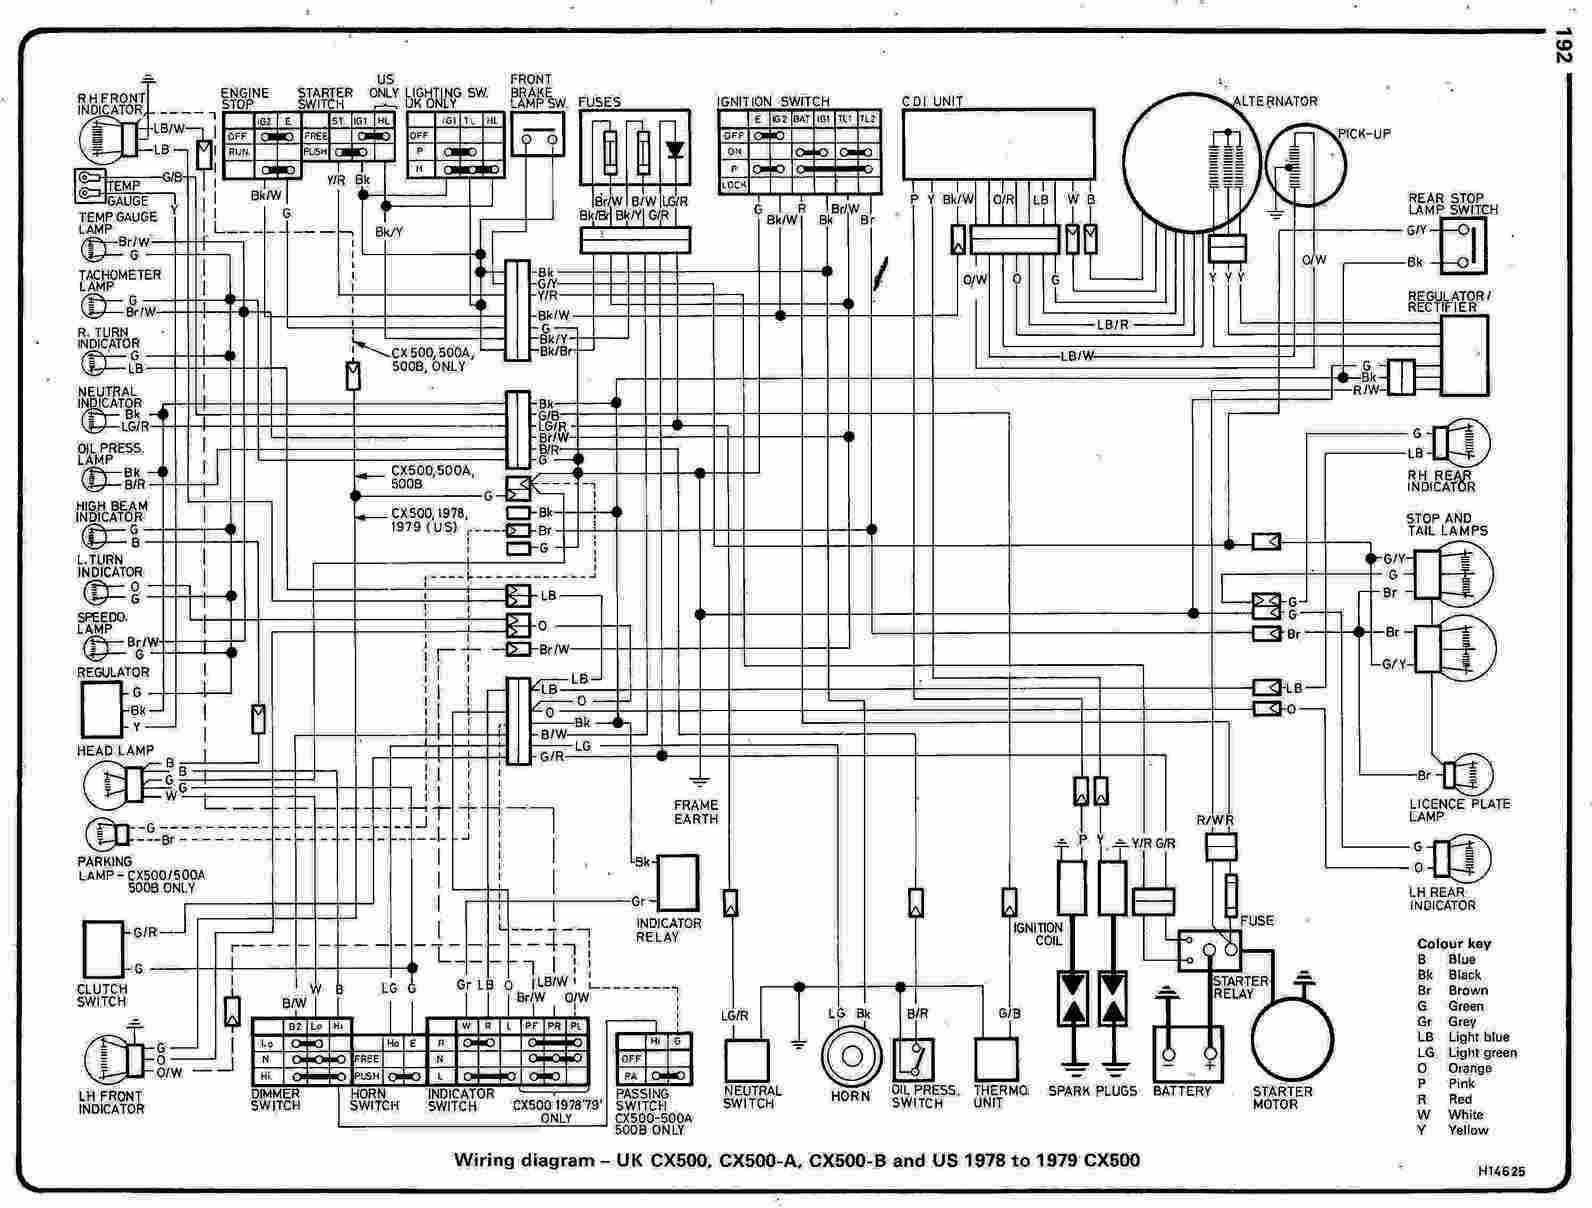 small resolution of 1981 honda cx500 custom wiring diagram wiring diagram review 81 honda goldwing wiring diagram 81 honda wiring diagram